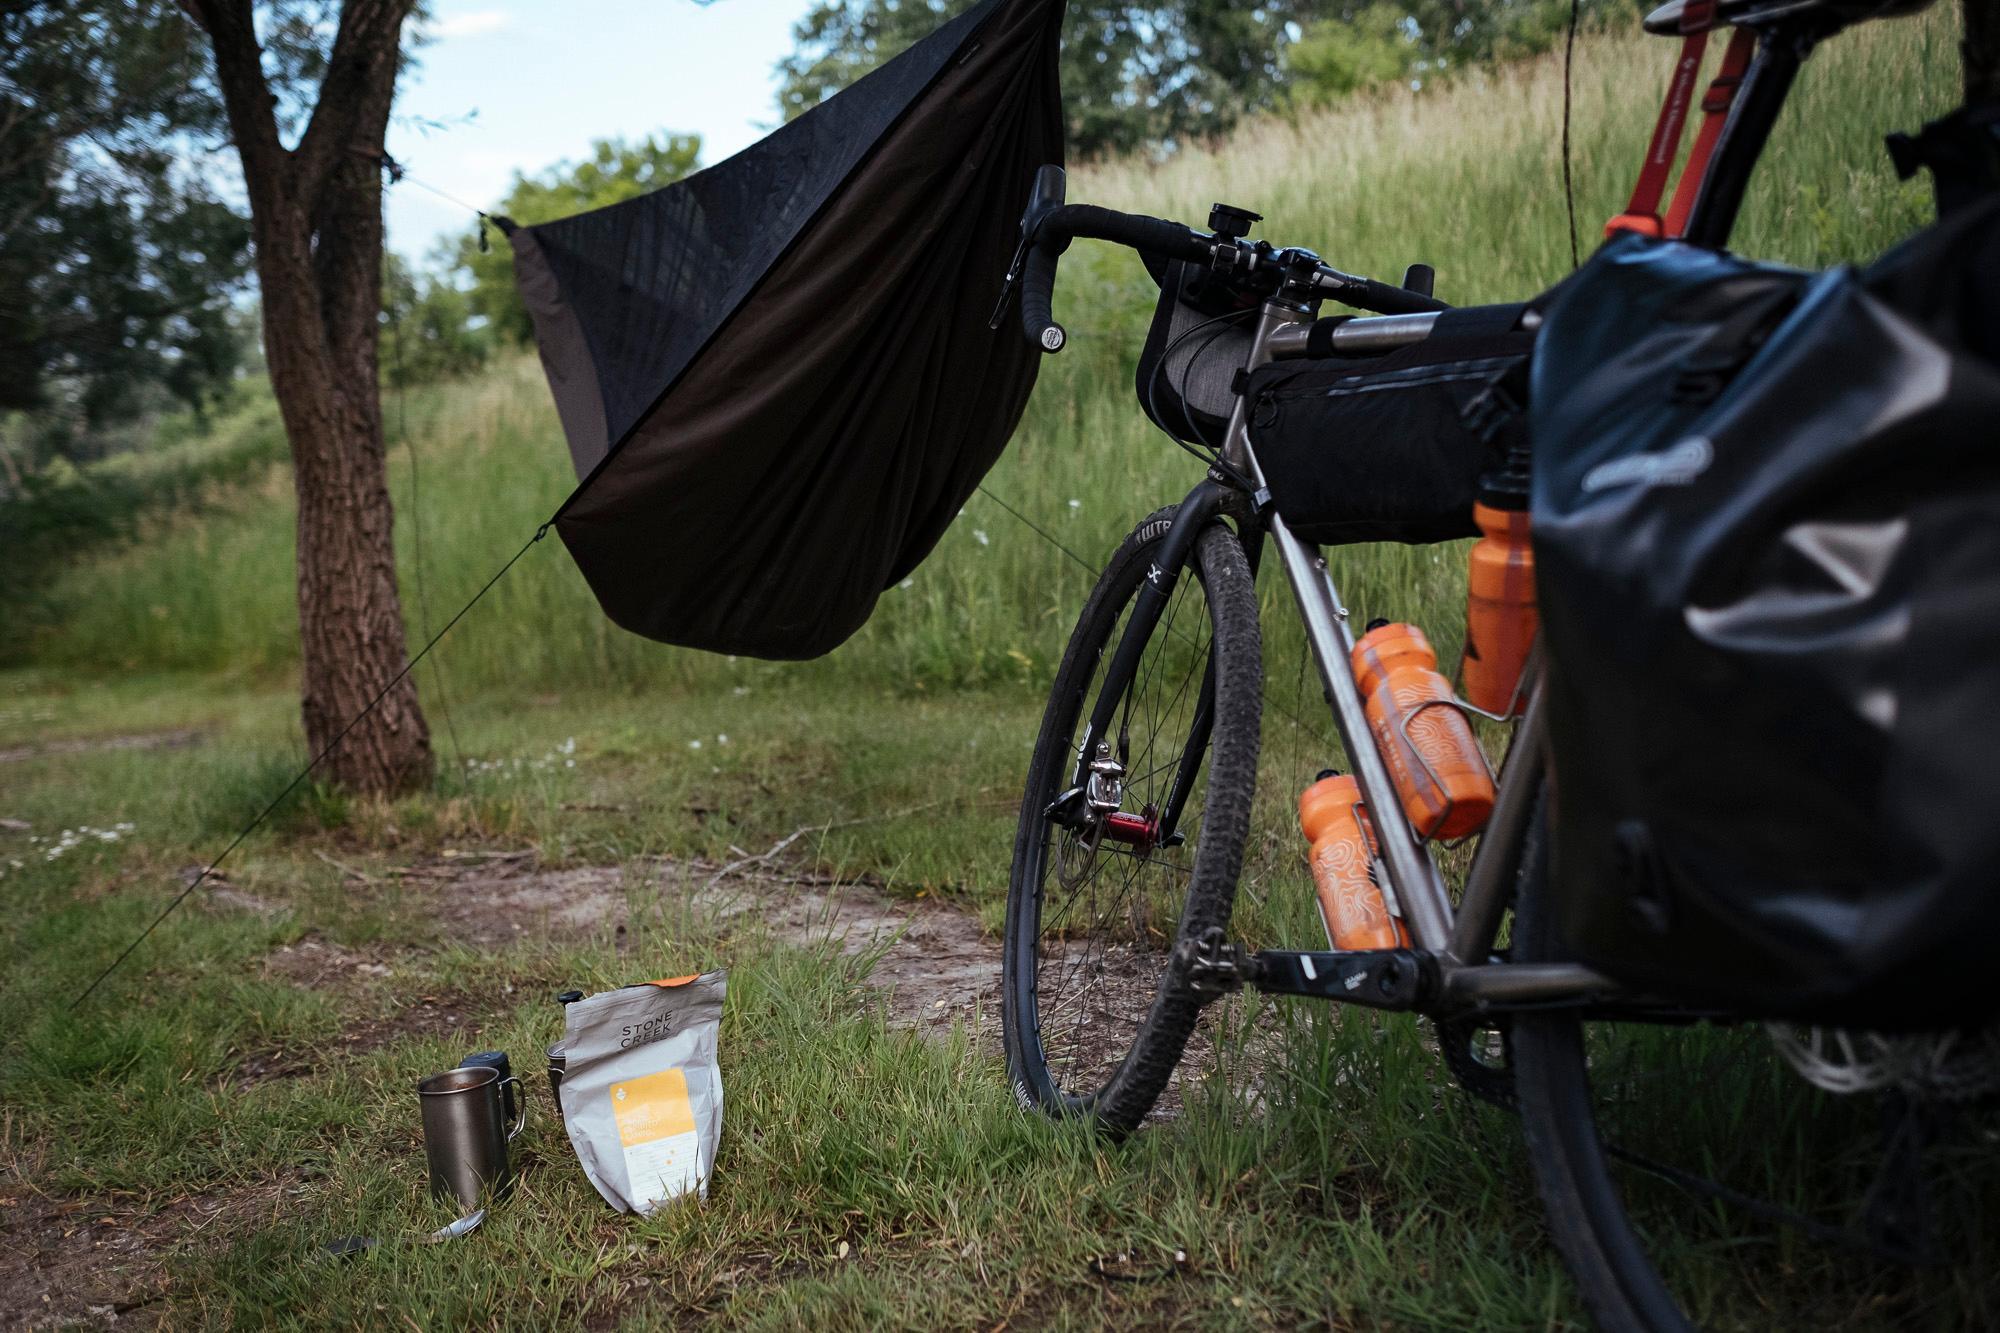 Ultralight hammock camping setup and good coffee. Kaukauna, WI